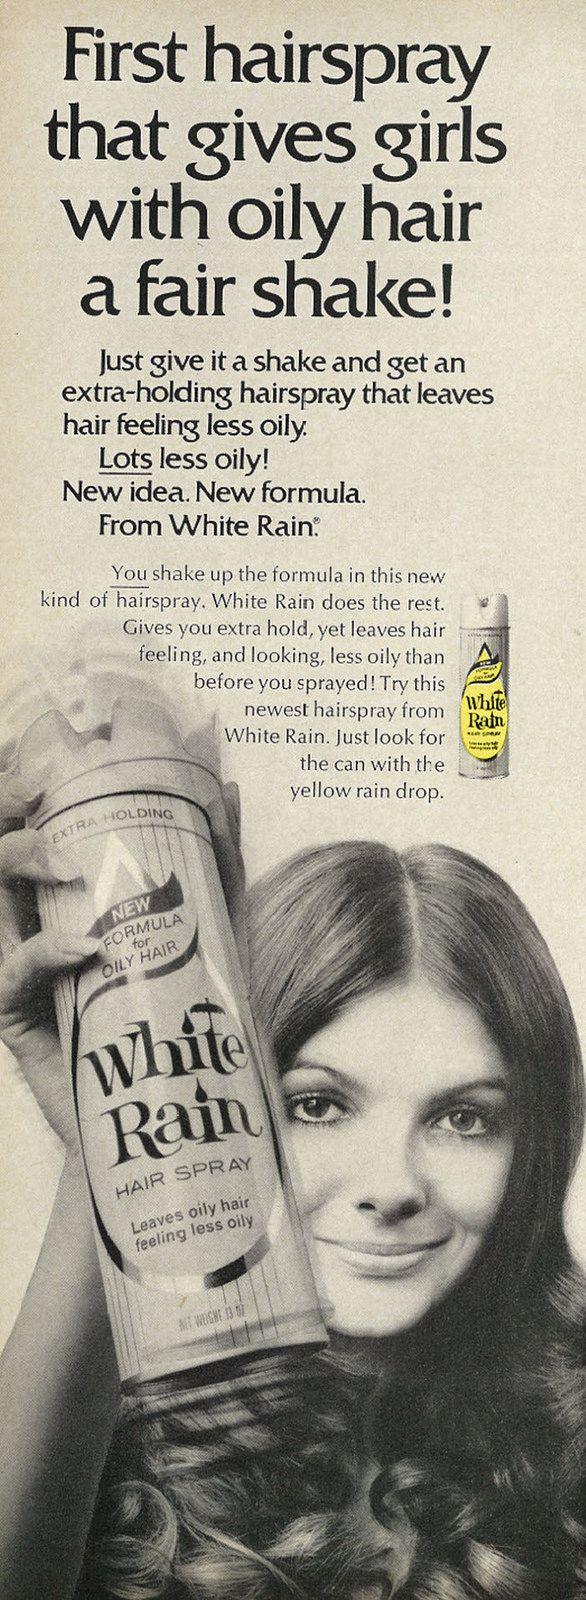 white rain hair spray with pretty brunette tagline